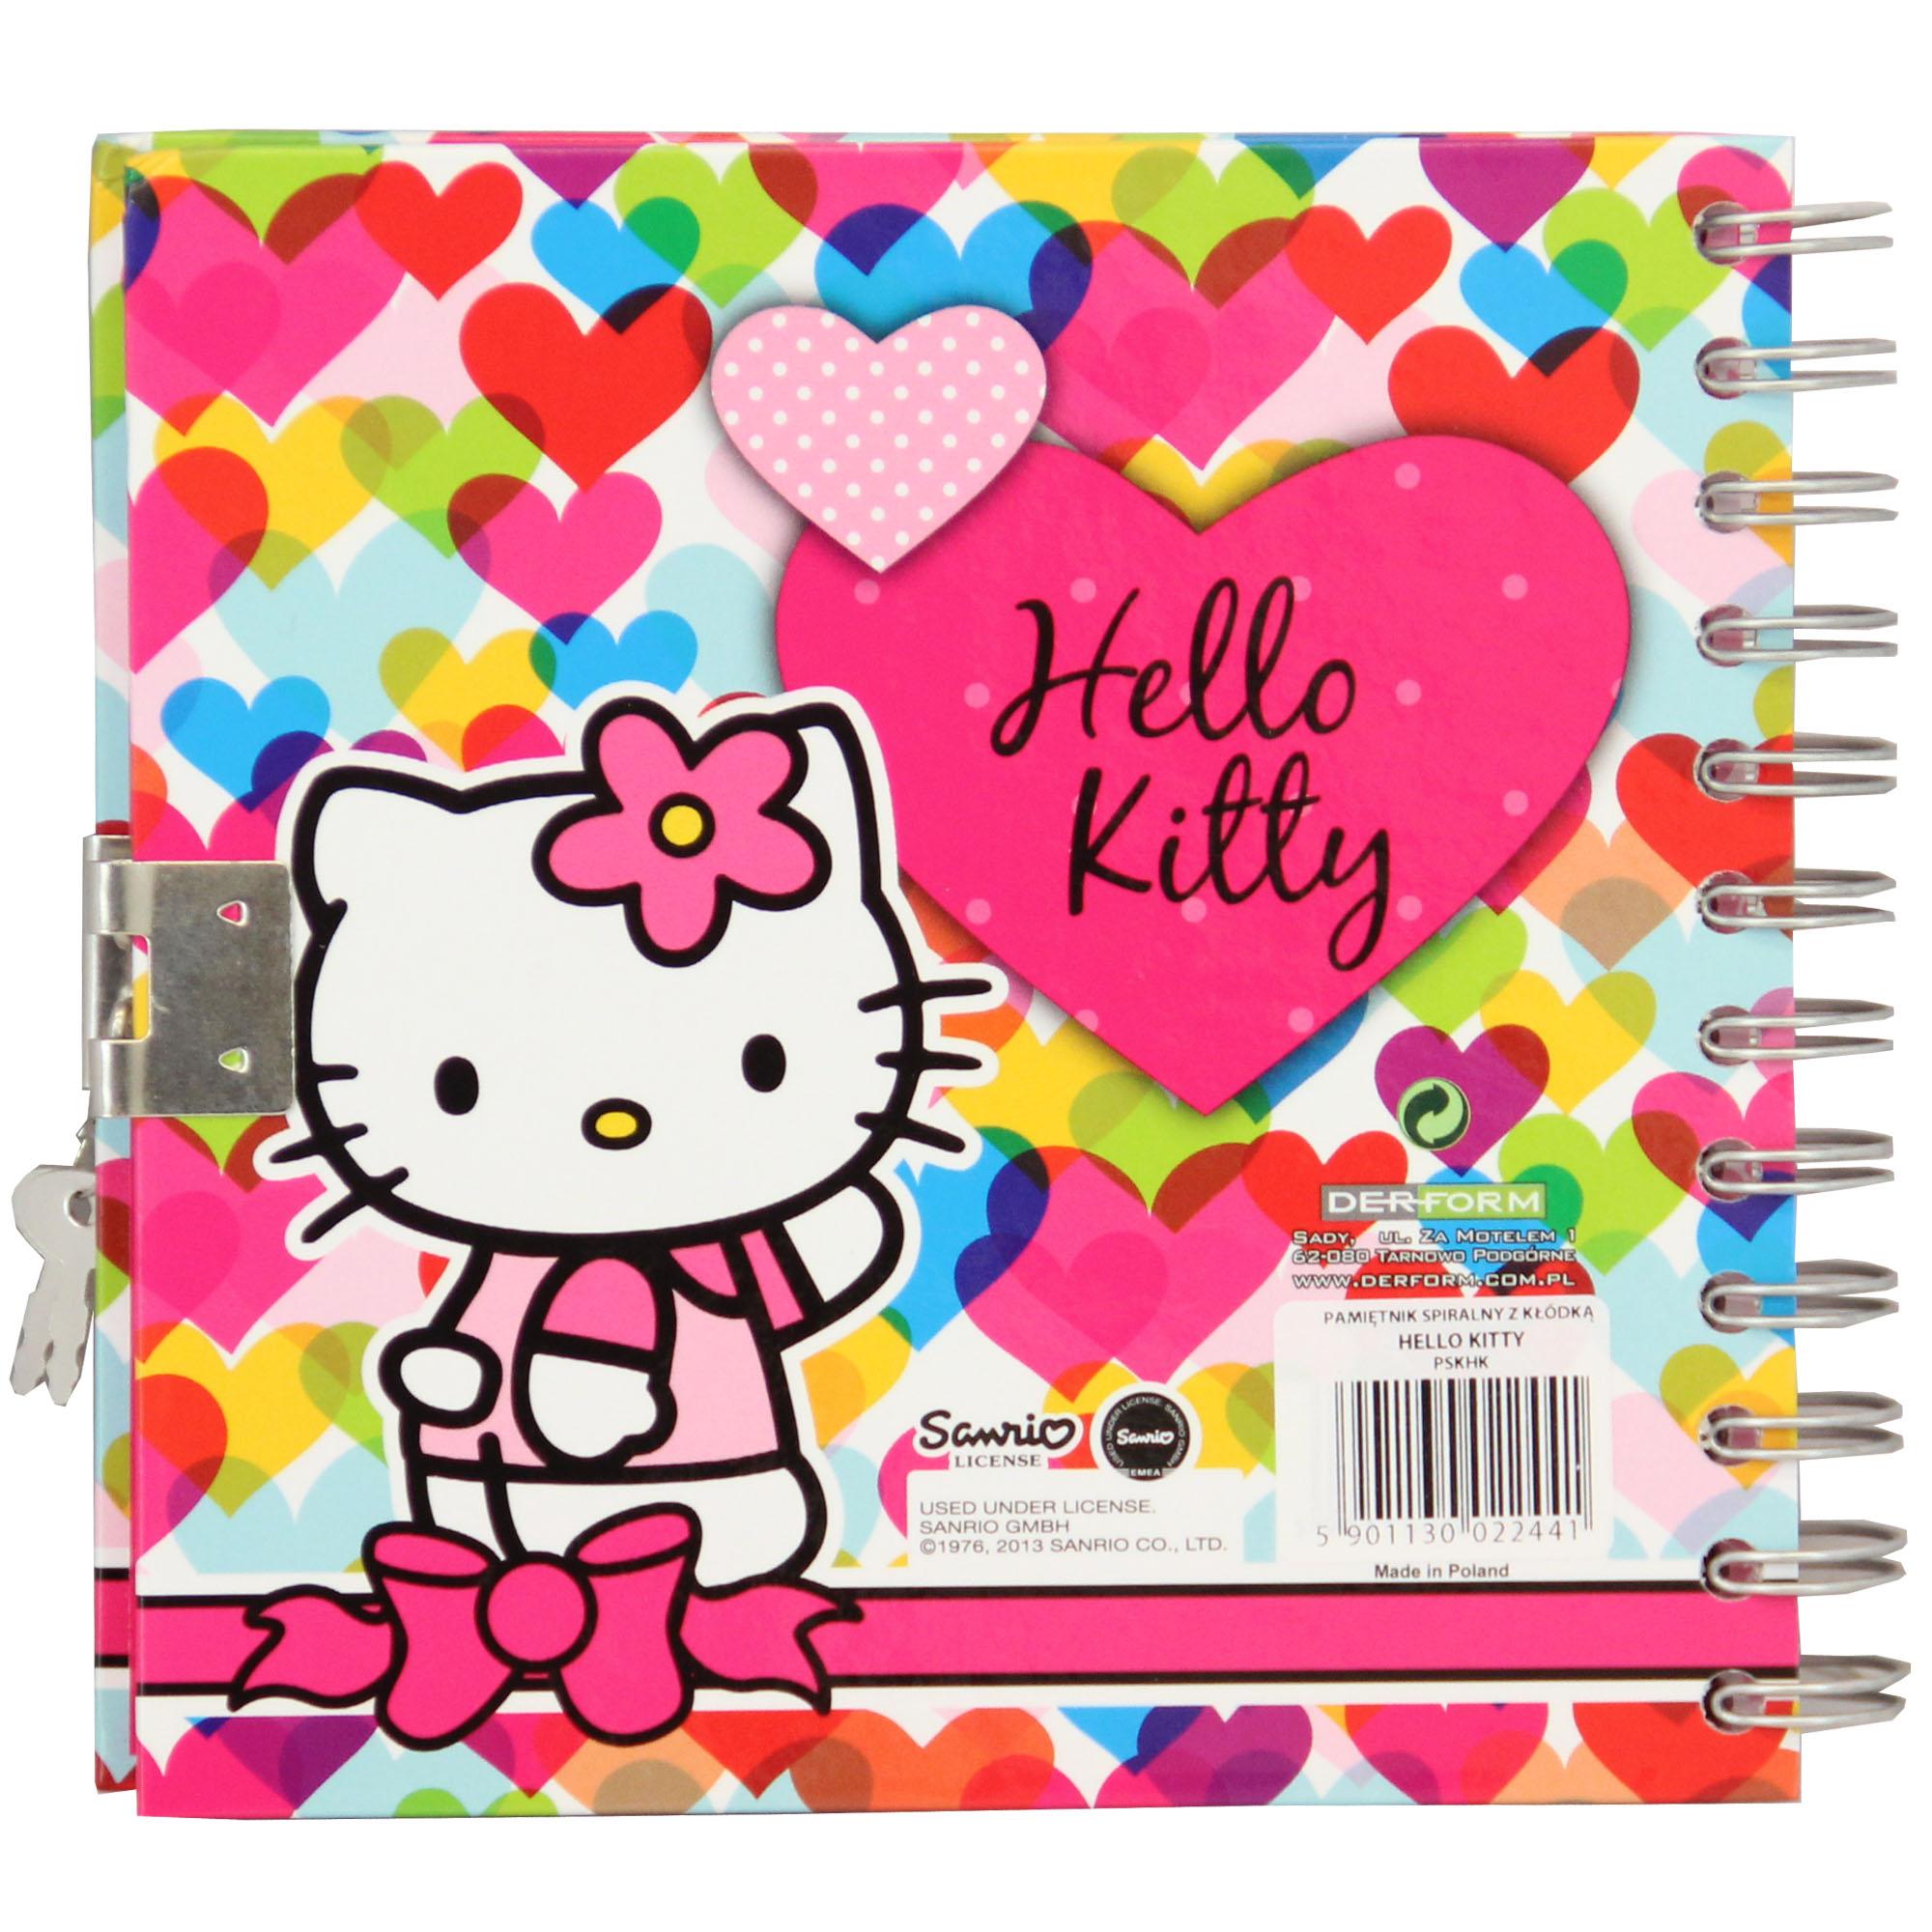 kittys diary essay Der hoehe der zeit mit e essay v christian mueller hello kittys little book of big  secret drawer locked diary helmut newton big nudes hello morning mastery.